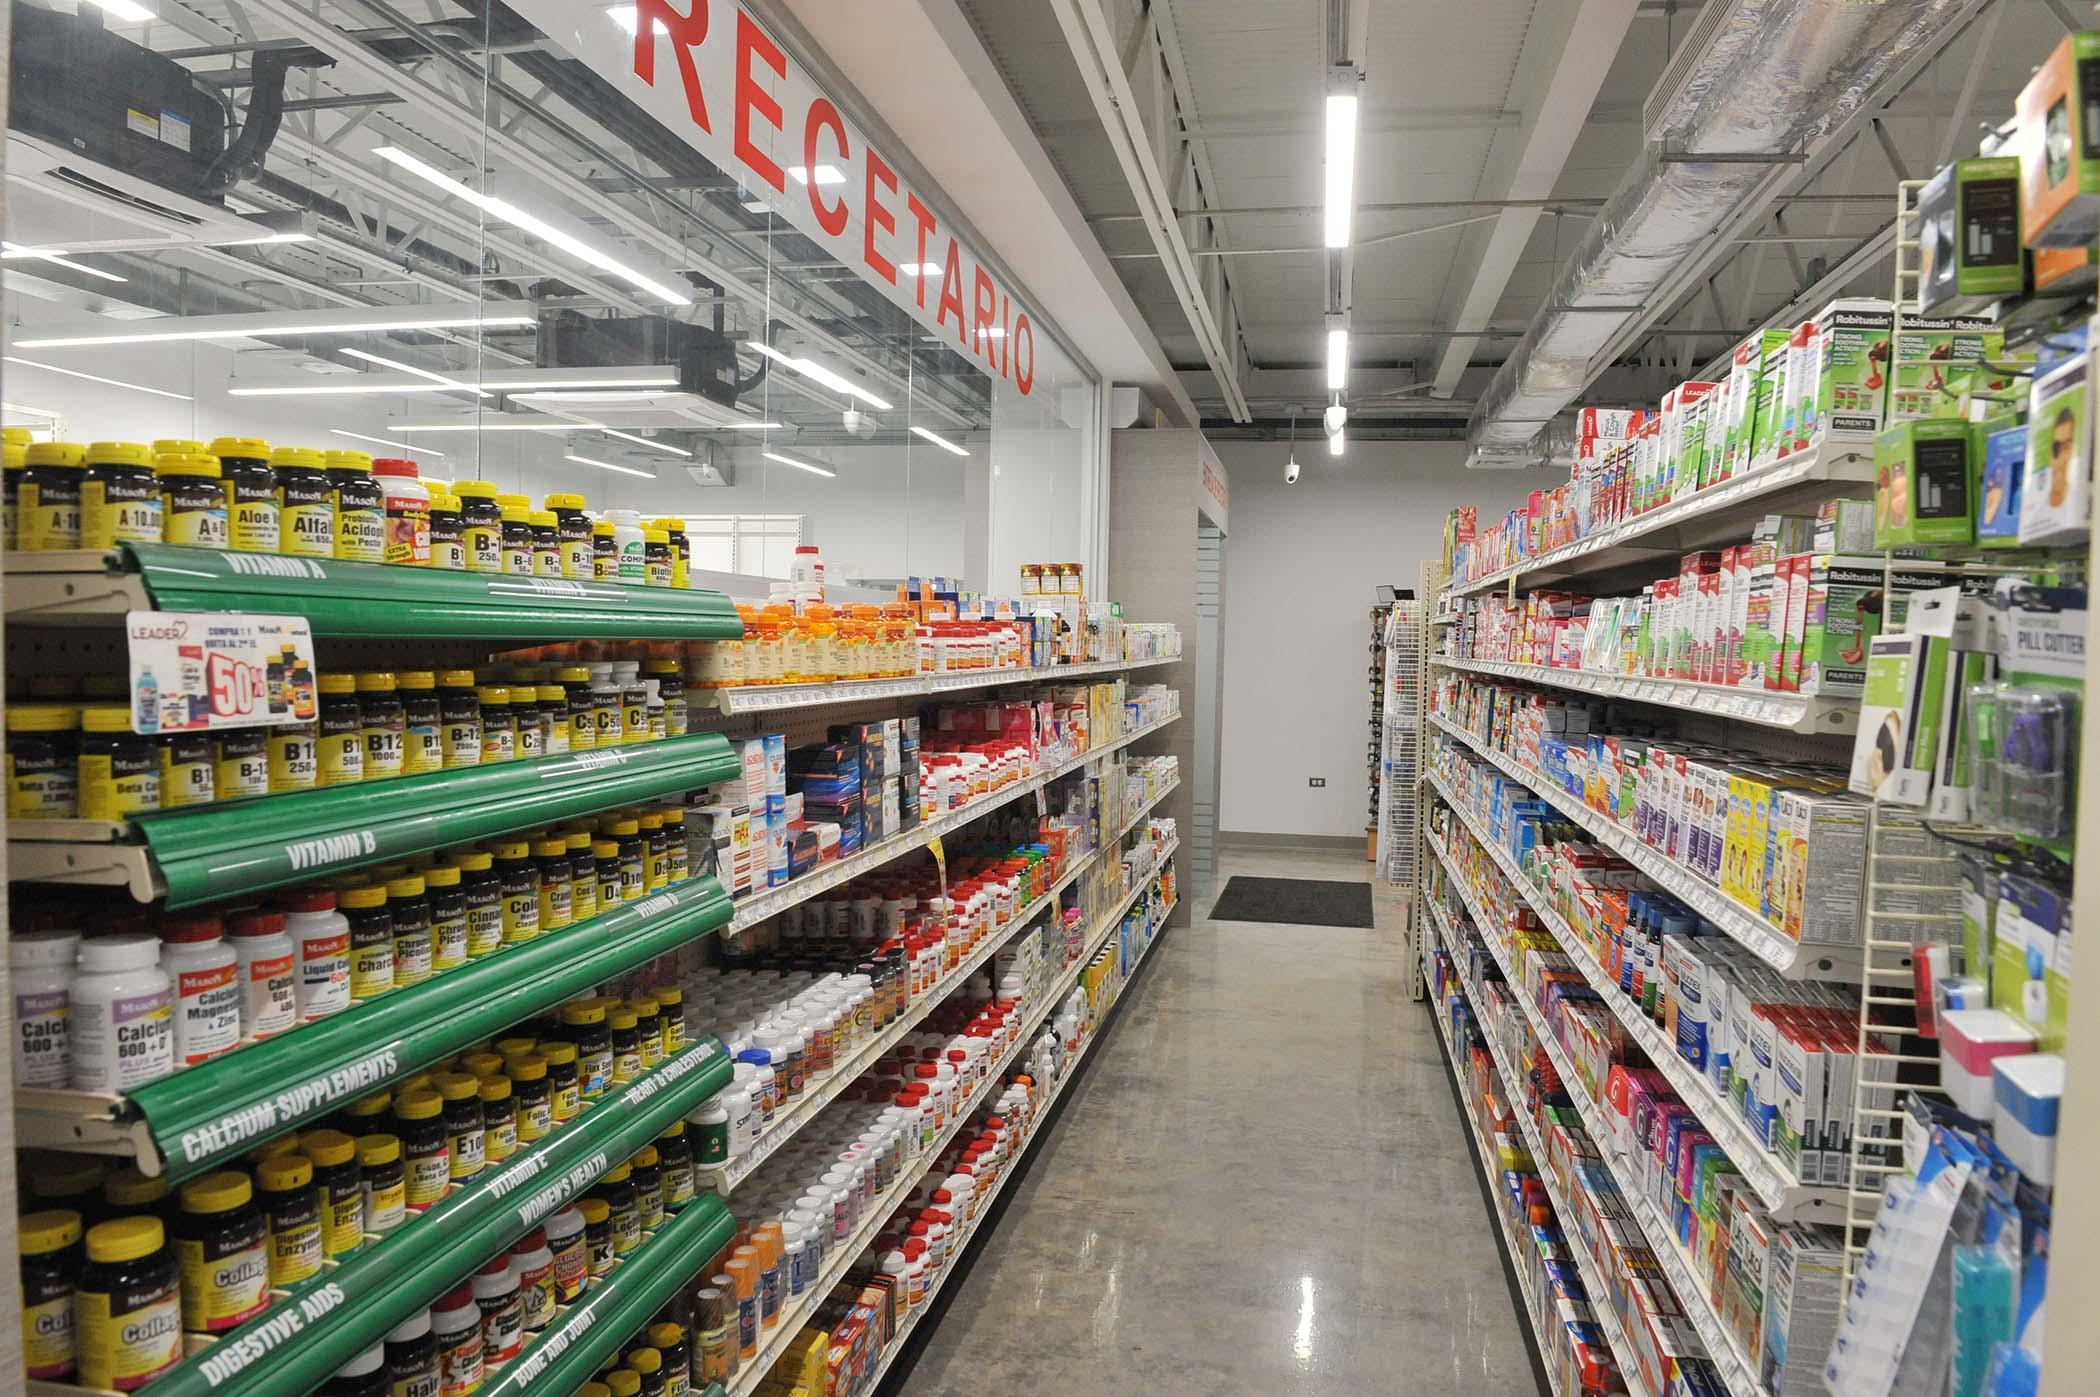 Inauguracion_Farmacias_Plaza-Plaza_del_Sol-11.jpg